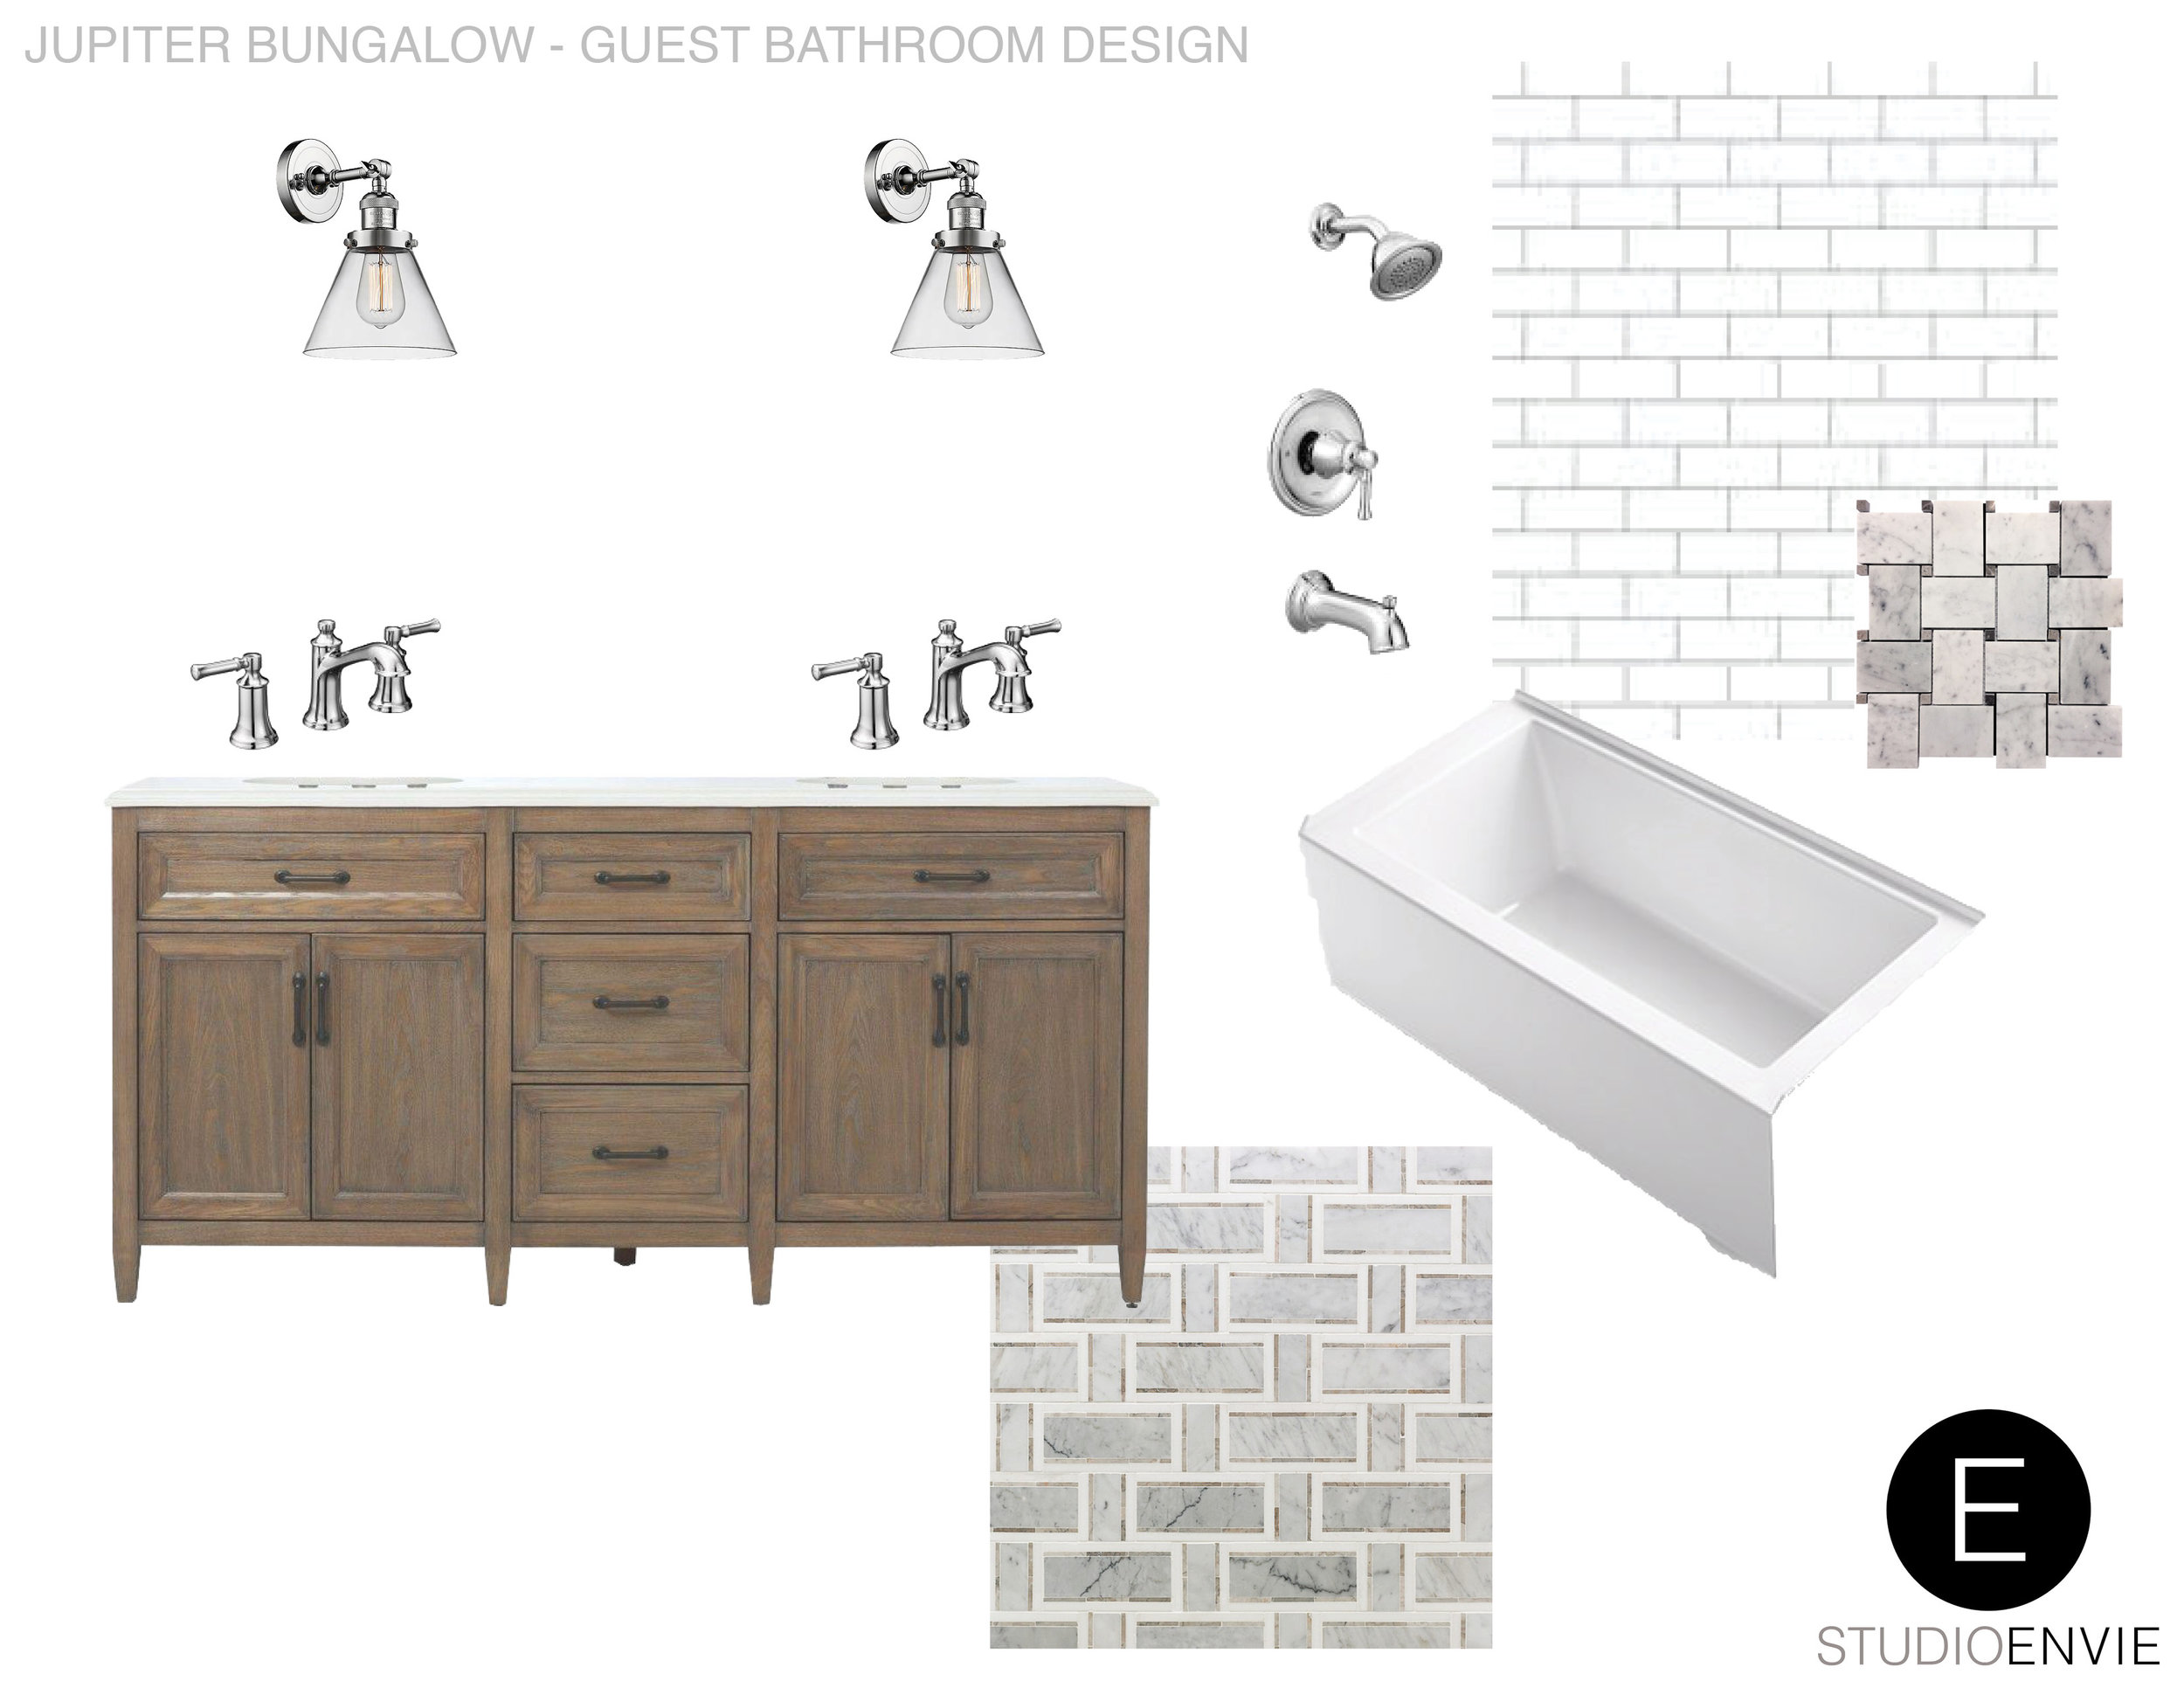 Guest Bathroom Design.jpg